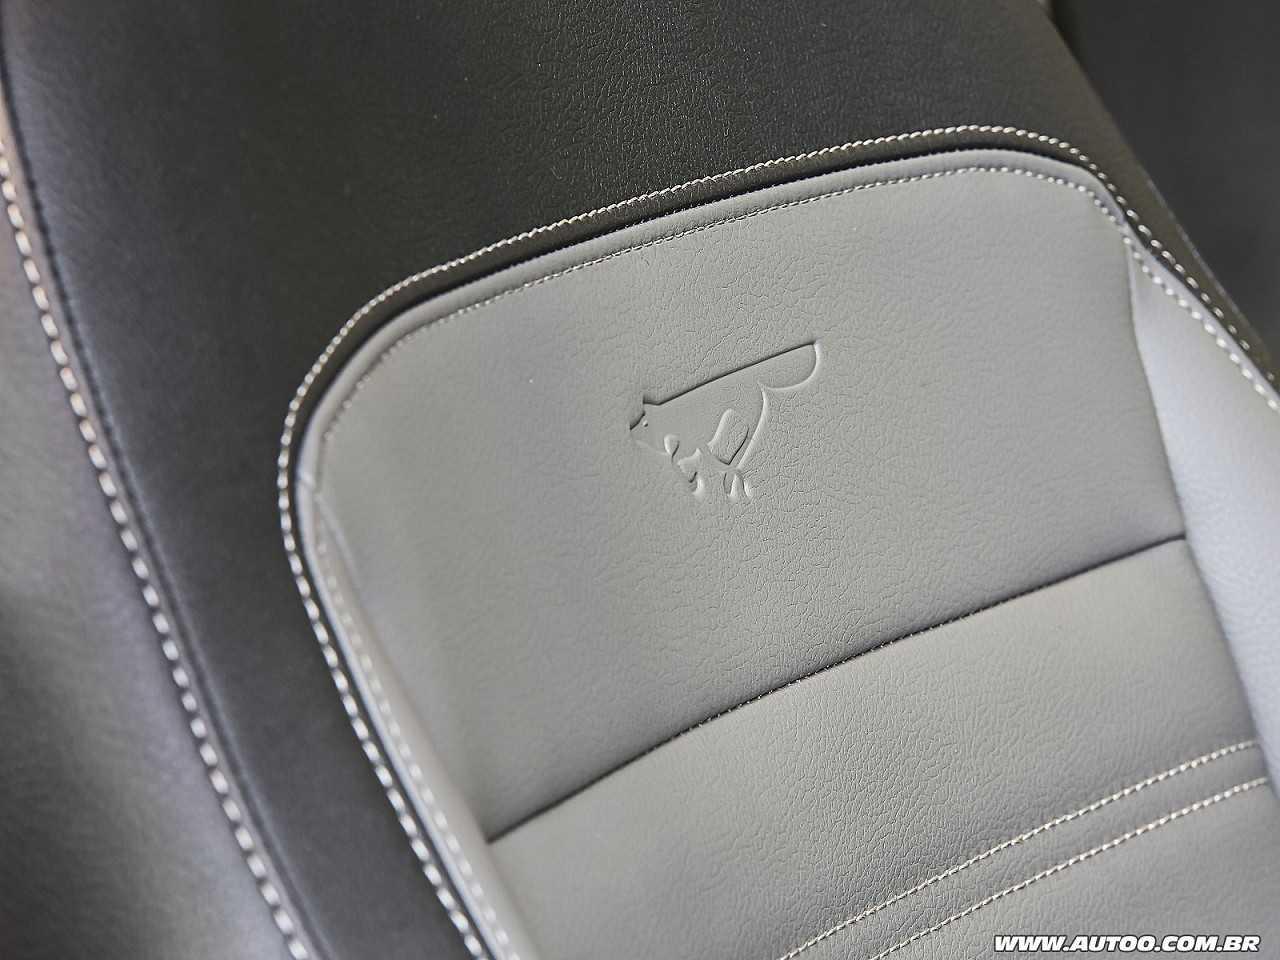 VolkswagenPolo 2018 - bancos dianteiros